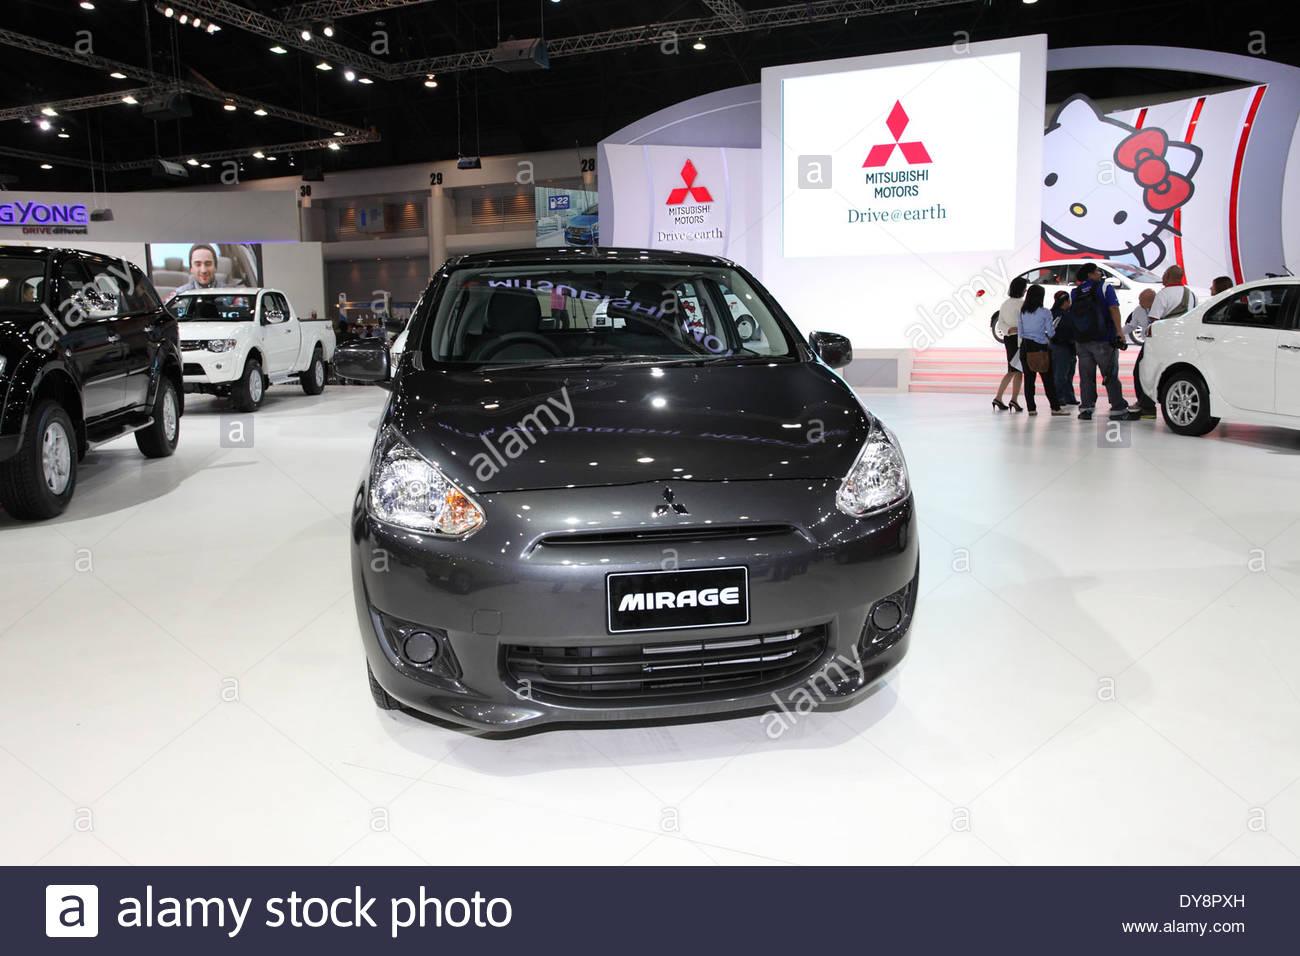 528620118 Mitsubishi Mirage car on display Stock Photo: 68420425 - Alamy